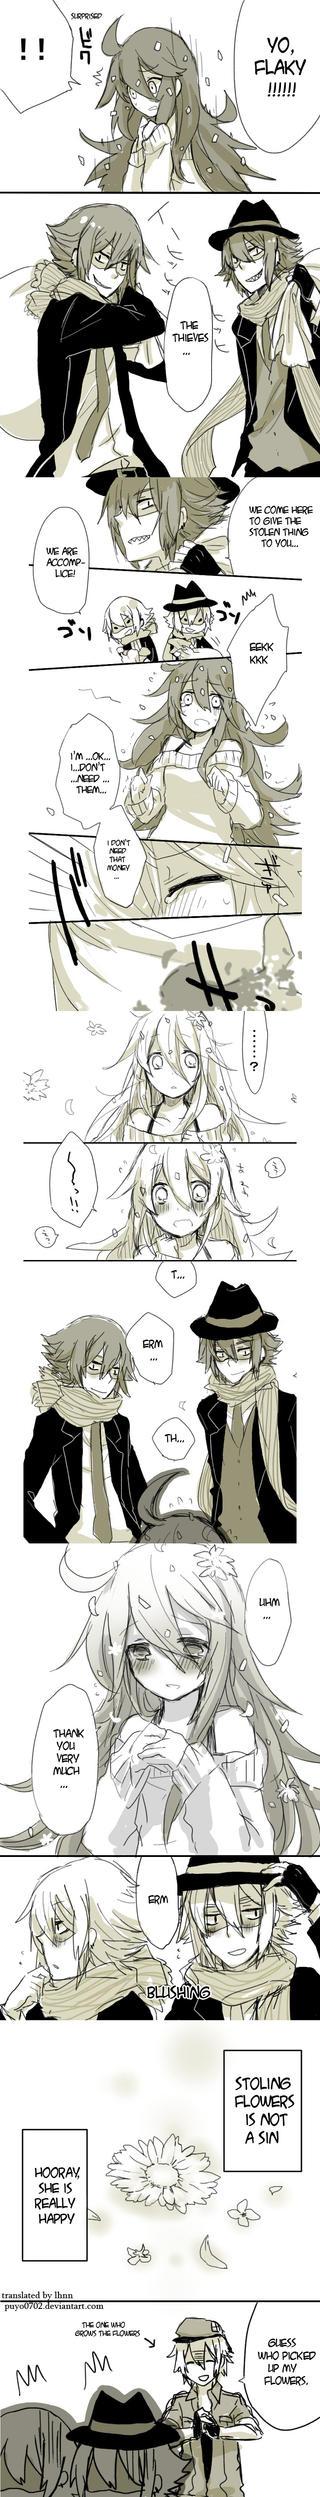 HTF doujinshi translation #2 by minglee7294